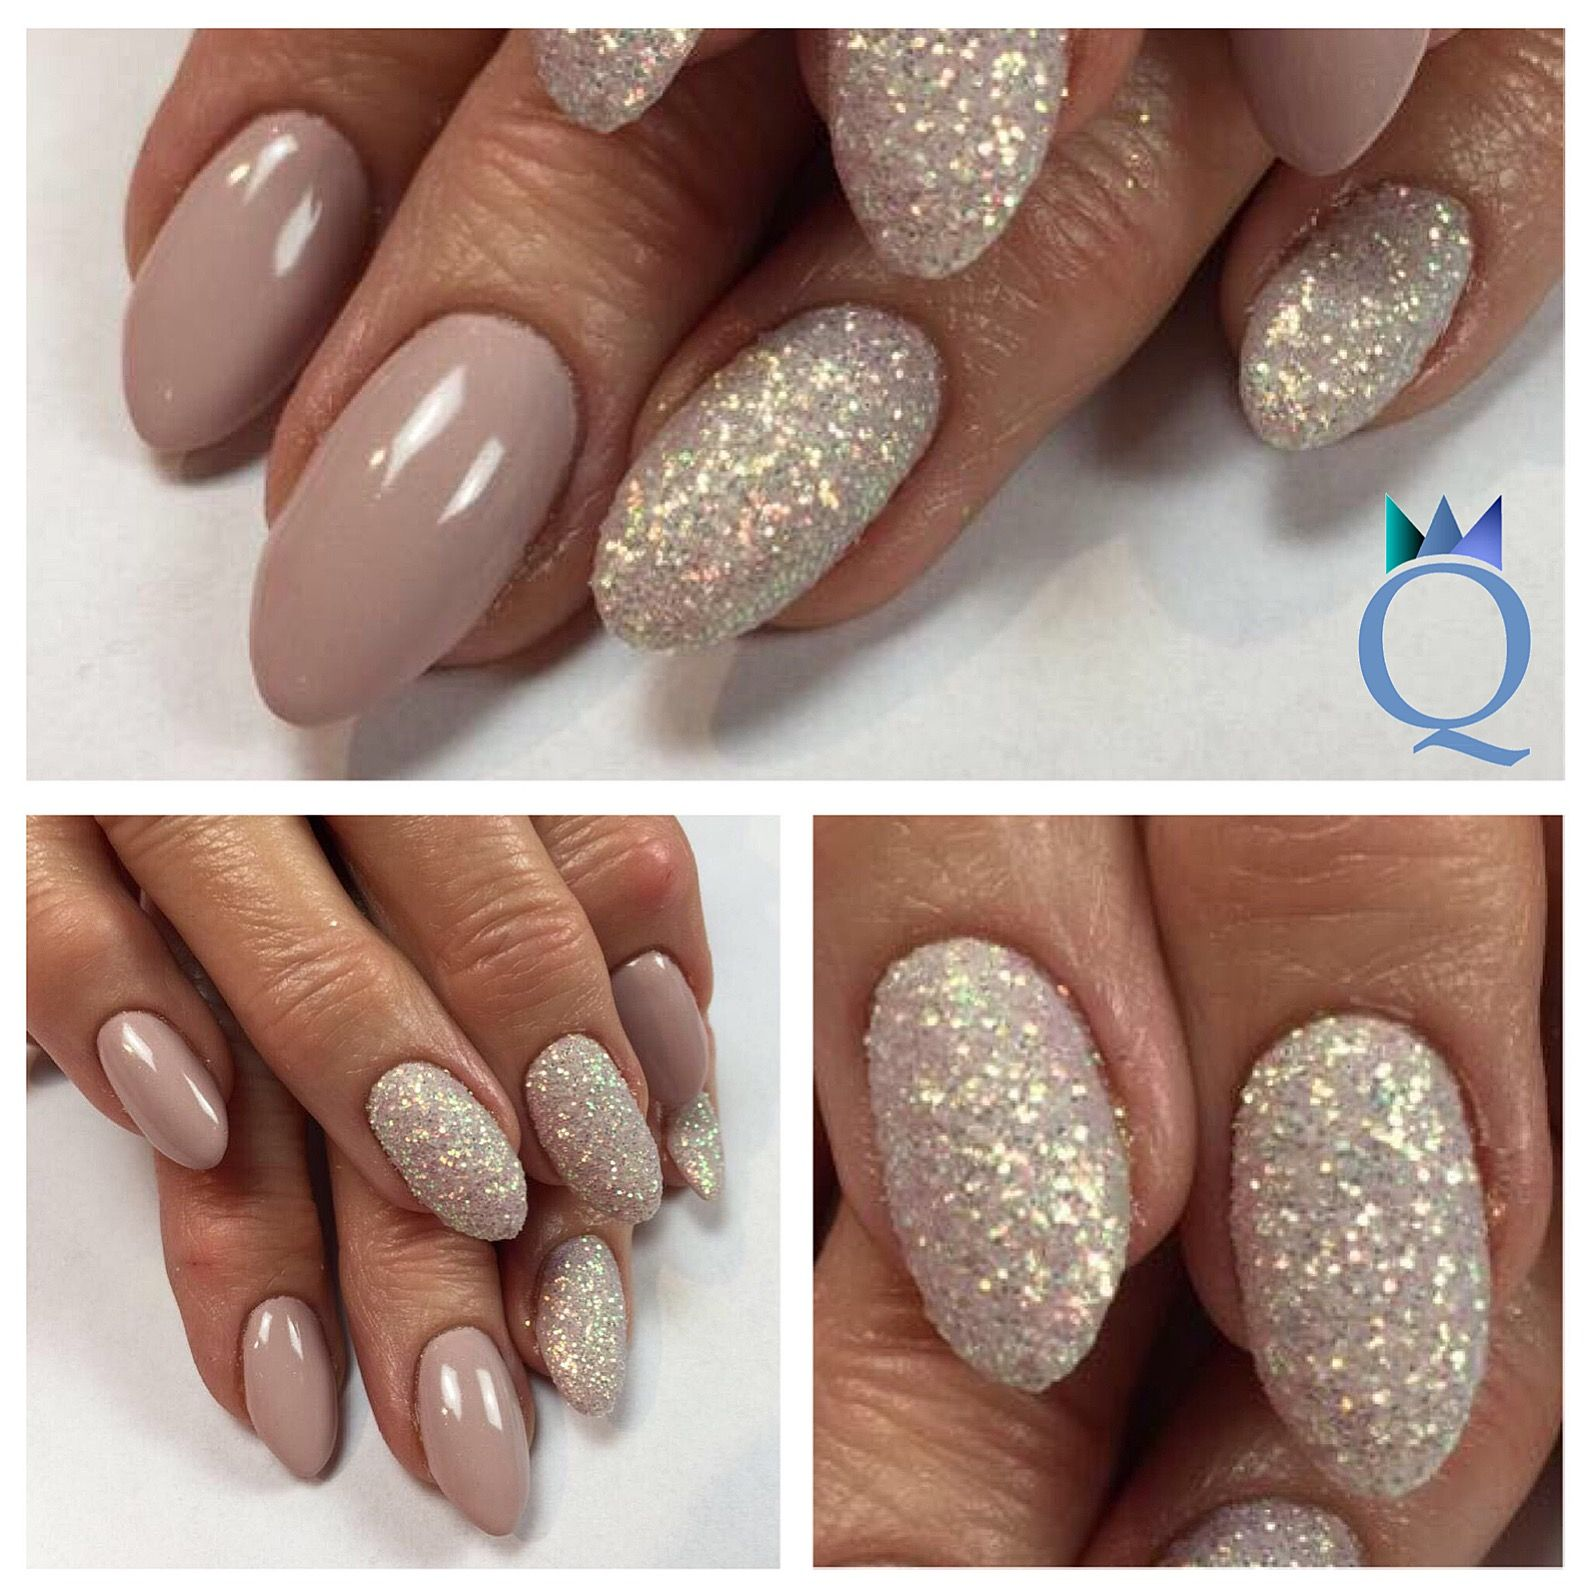 Almondnails Gelnails Nails Taupe Glitter Mandelform Gelnagel